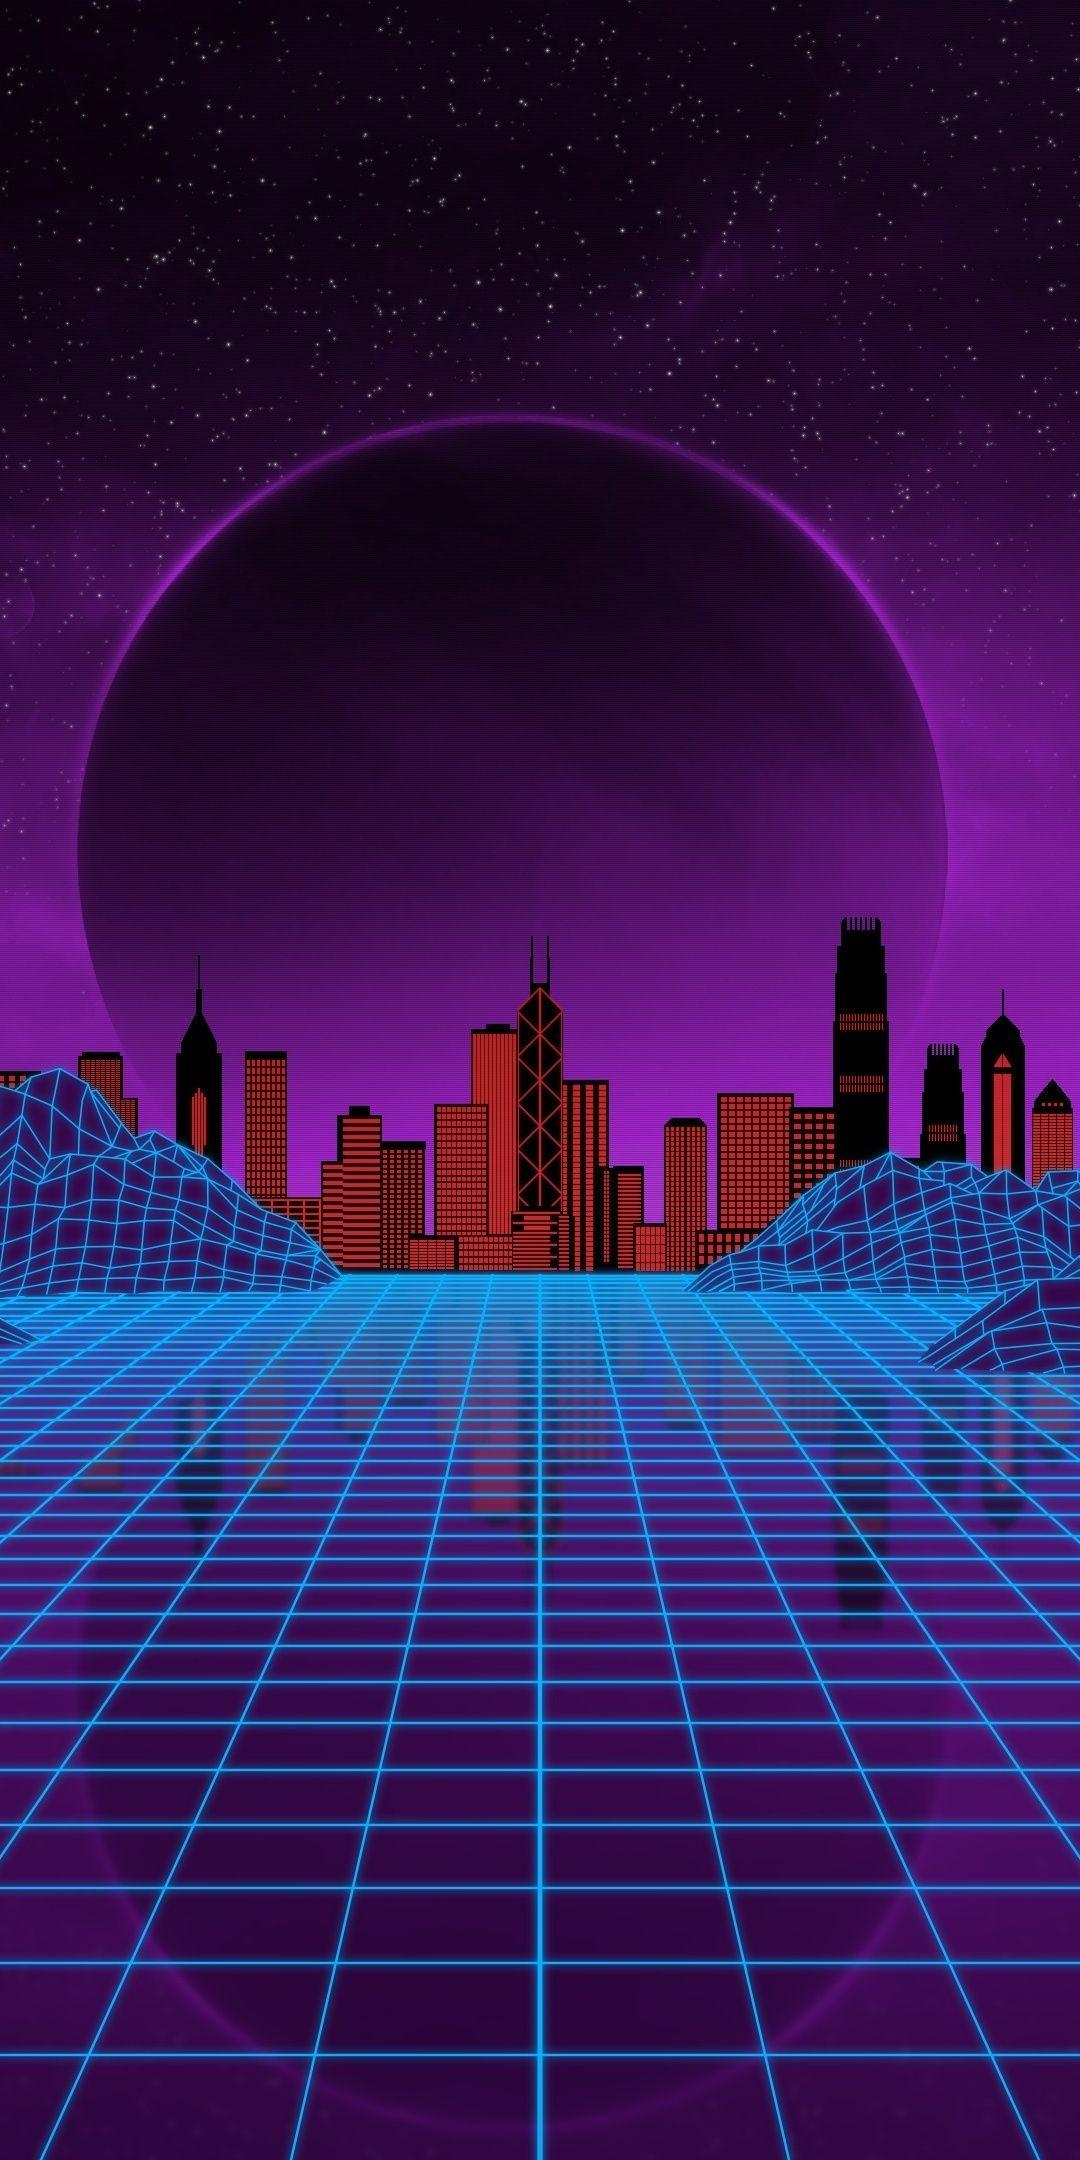 Synthwave, moon, city, cityscape, mountains, landscape